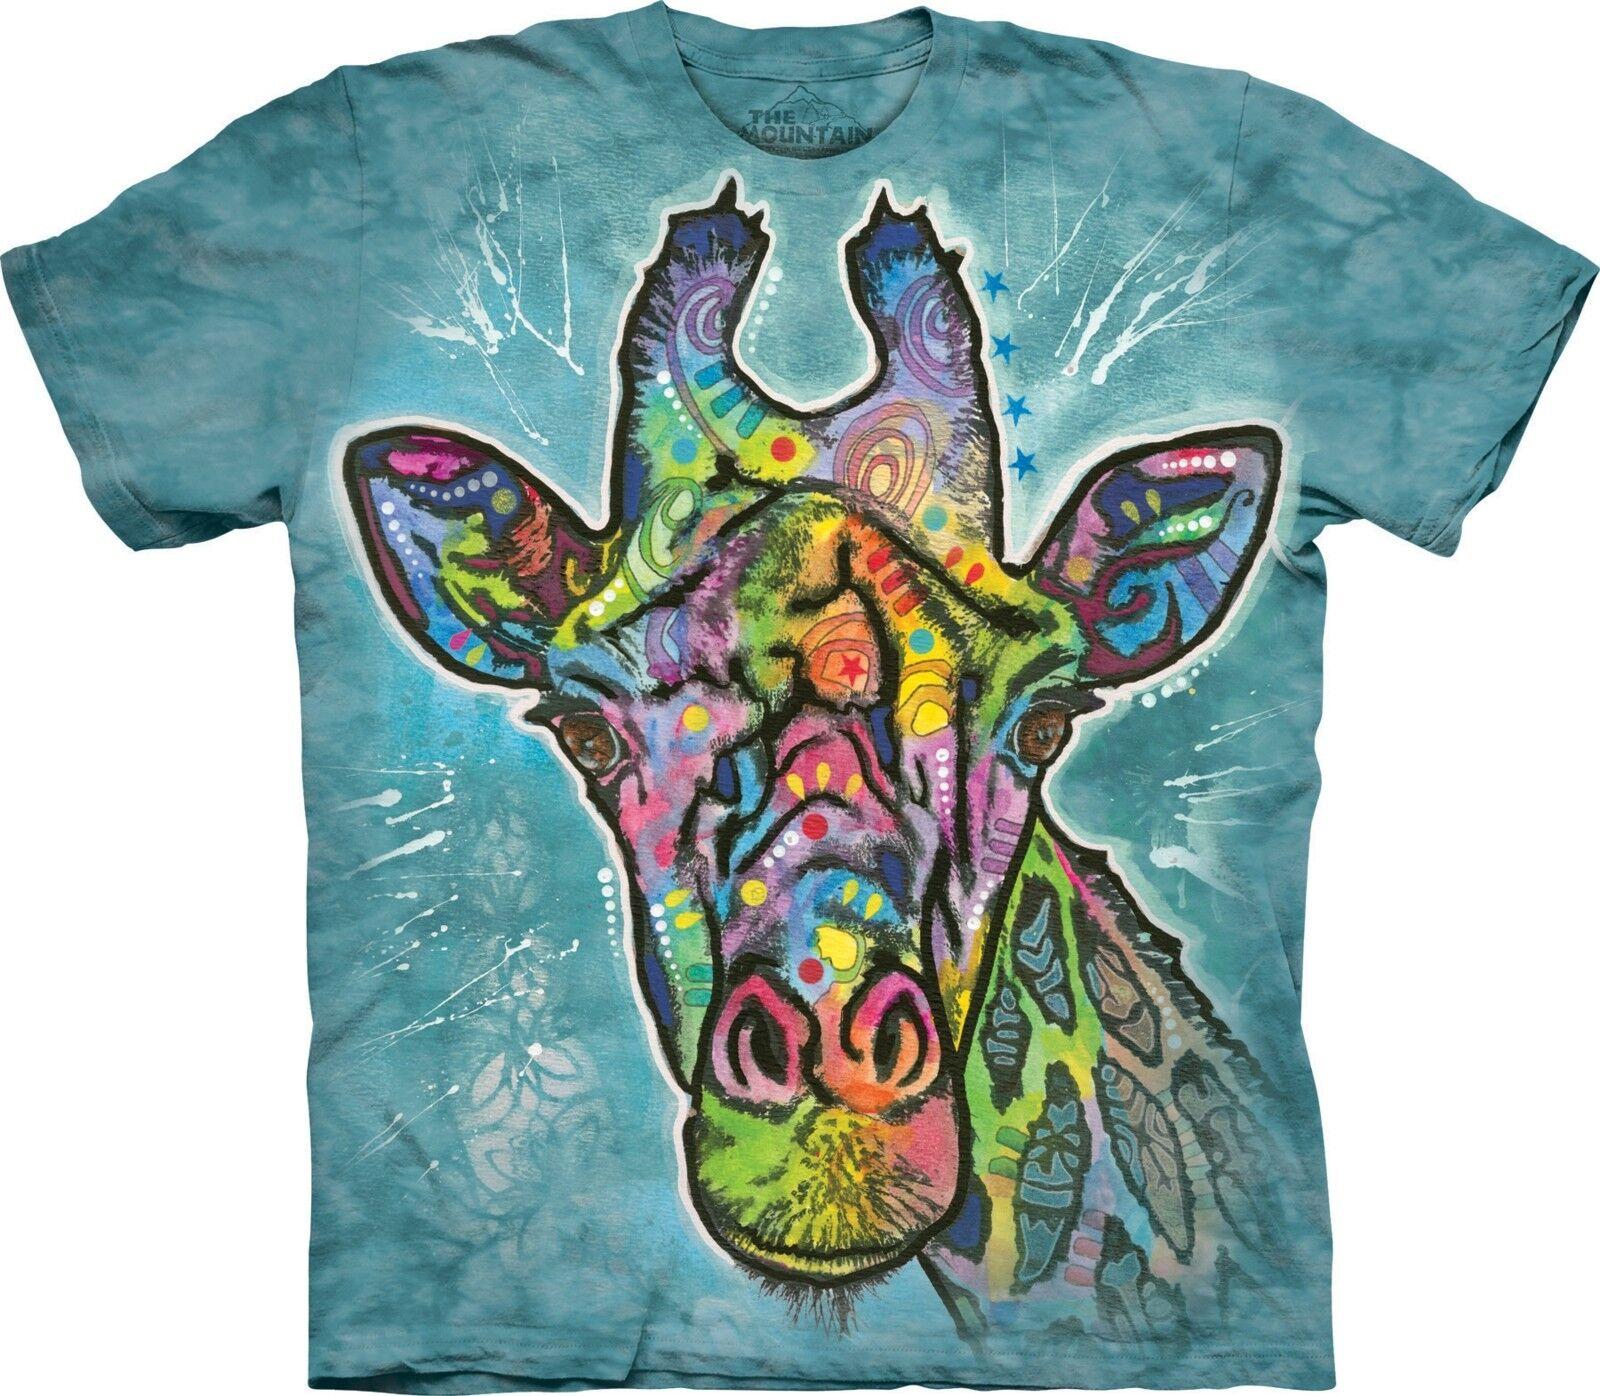 Russo Giraffe Animal T Shirt Adult Unisex The Mountain